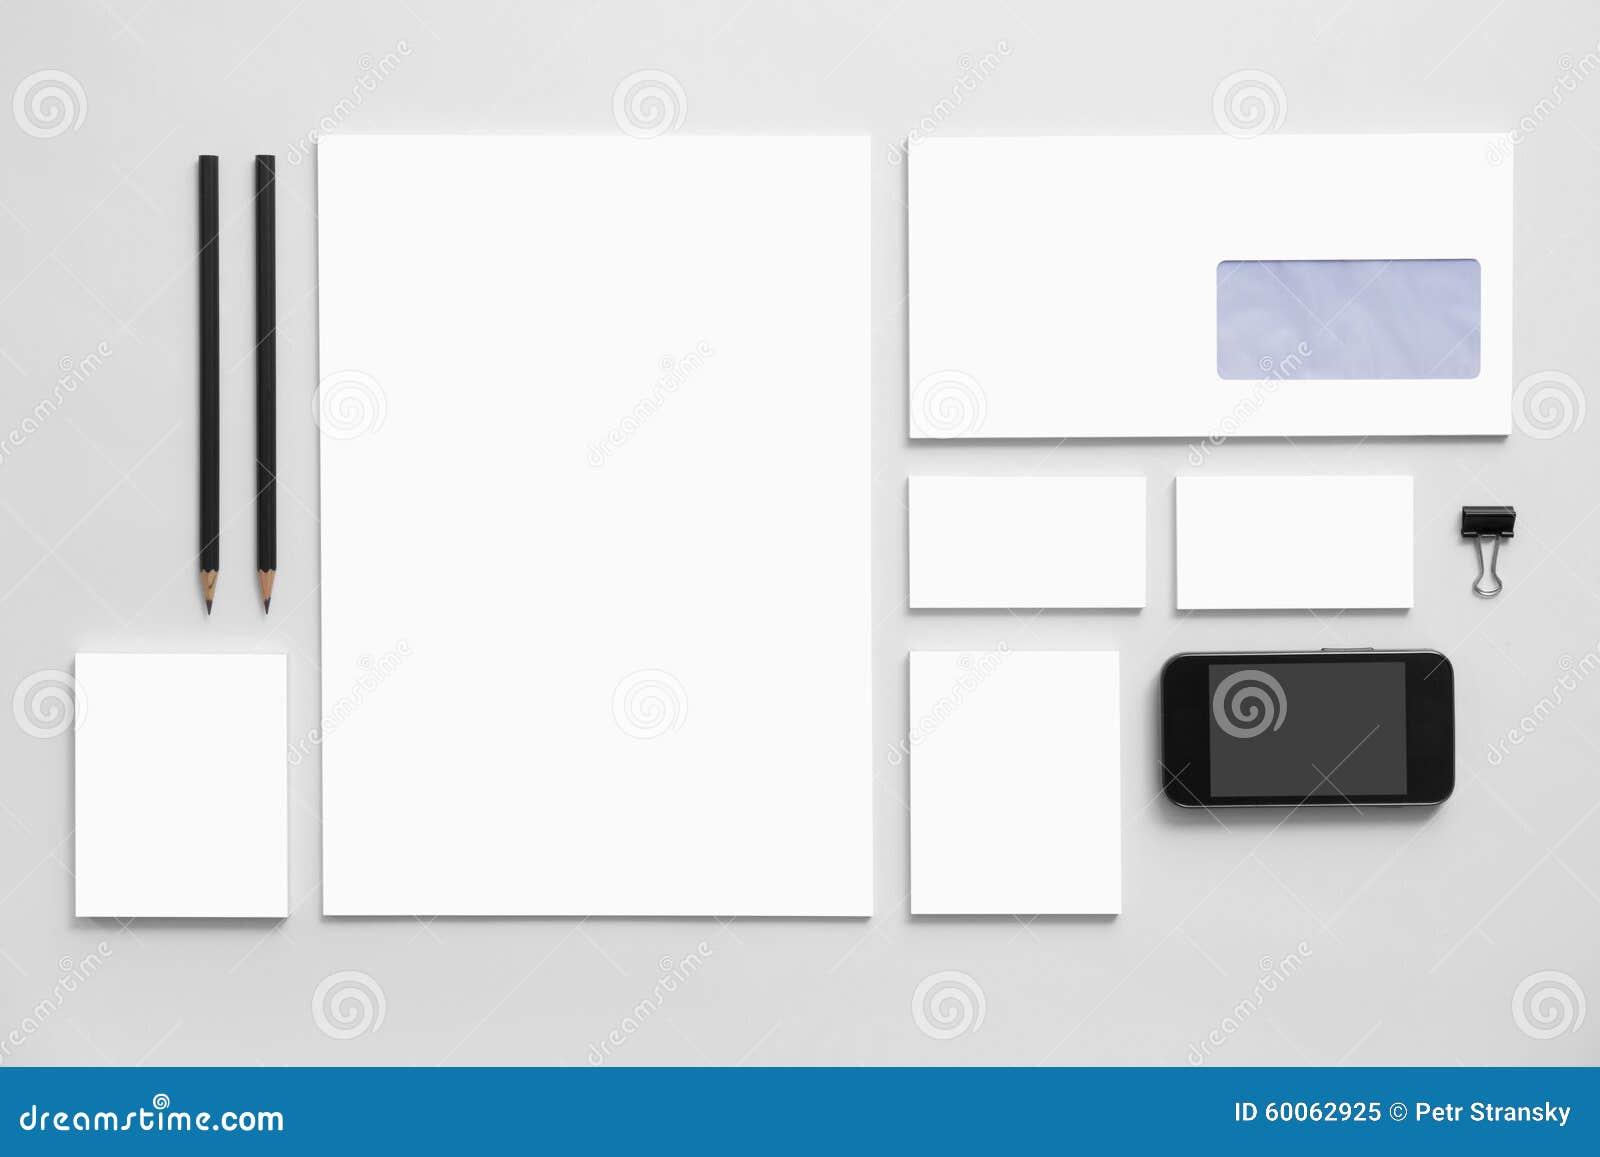 mock up business branding template on gray stock image image 60062925. Black Bedroom Furniture Sets. Home Design Ideas